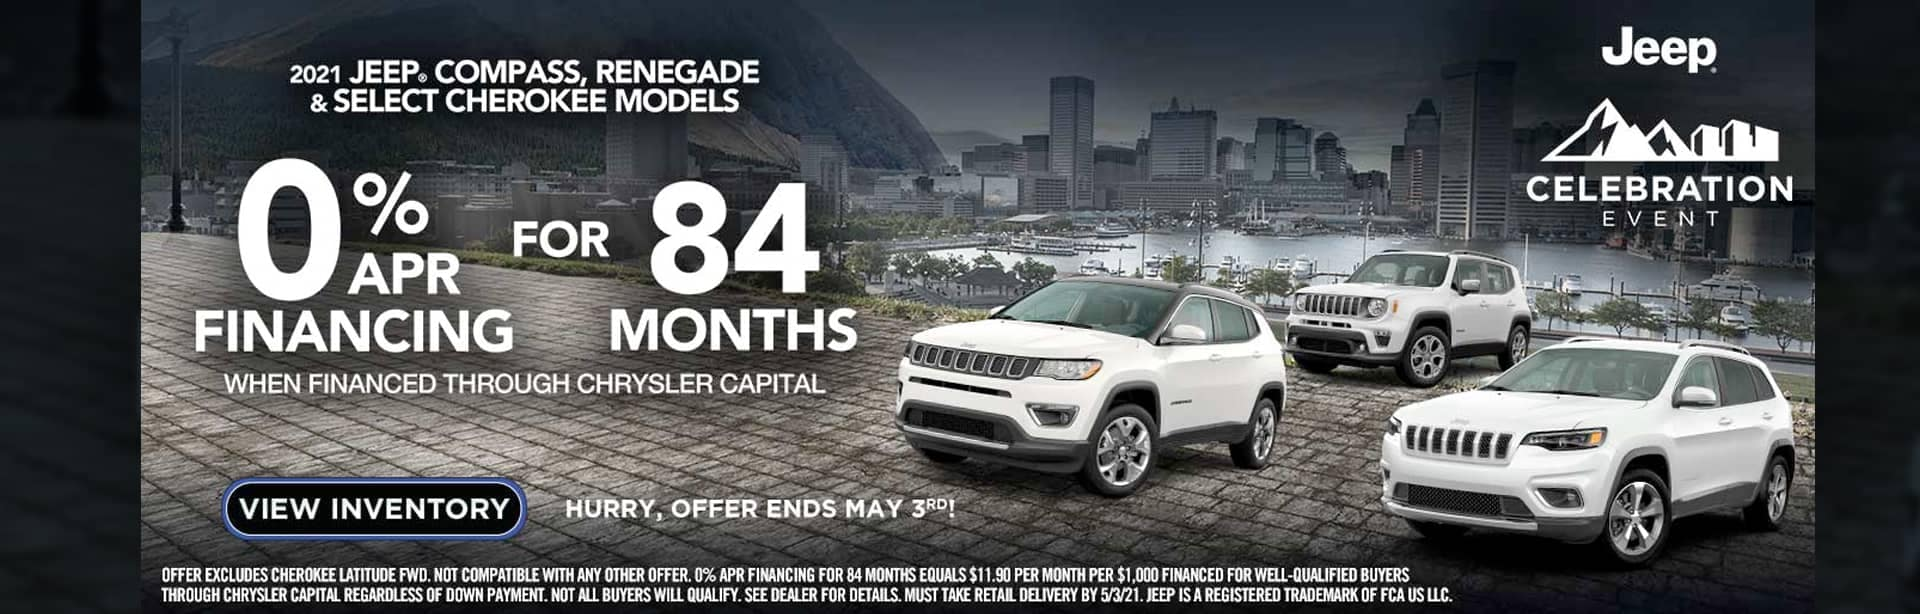 2021 Jeep Compass Renegade & Cherokee